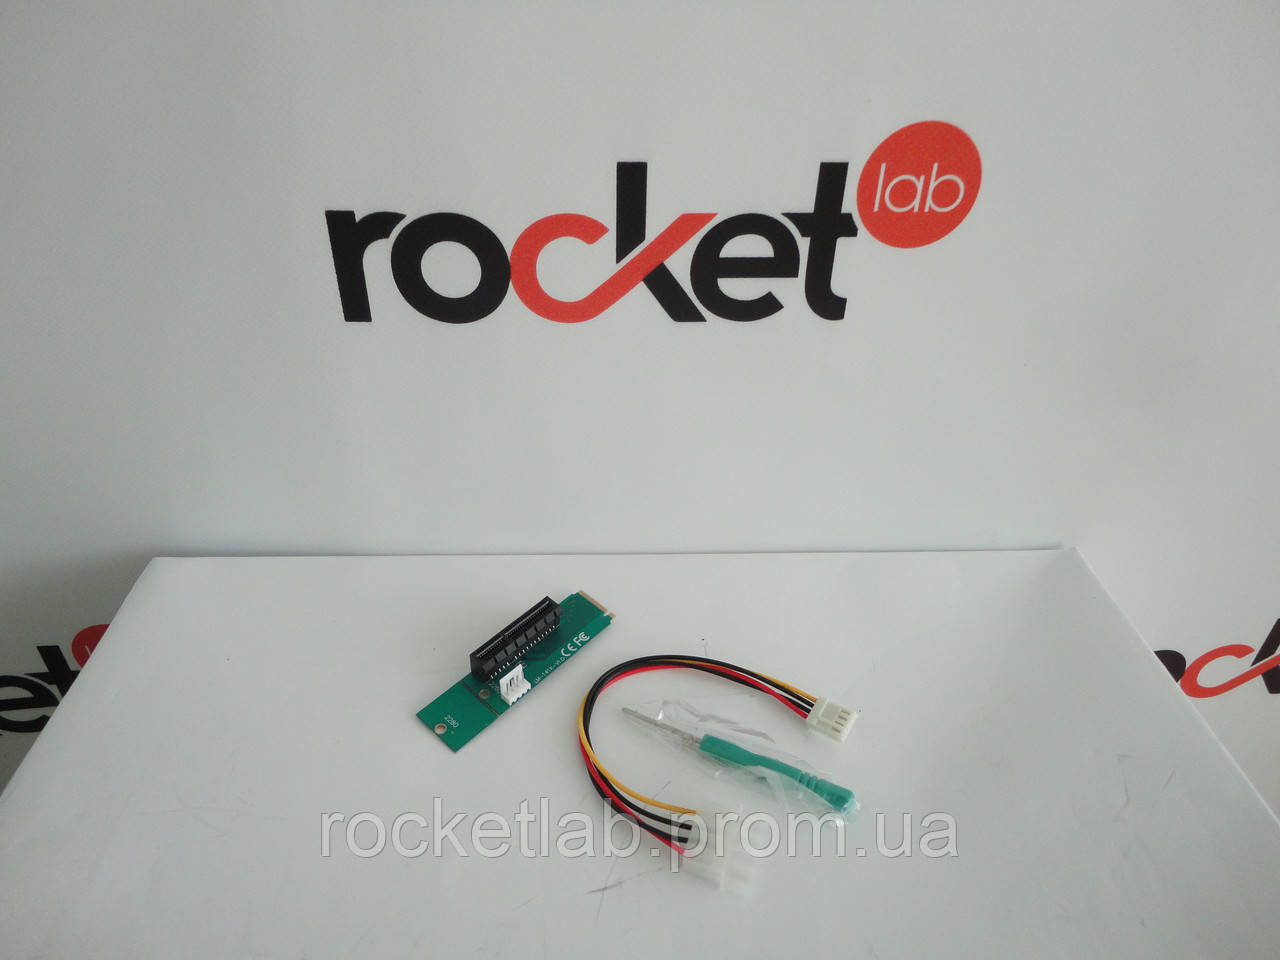 Переходник для видеокарты (адаптер) M2 на PCI-E 4X - RocketLab Лаборатория майнинга в Харькове